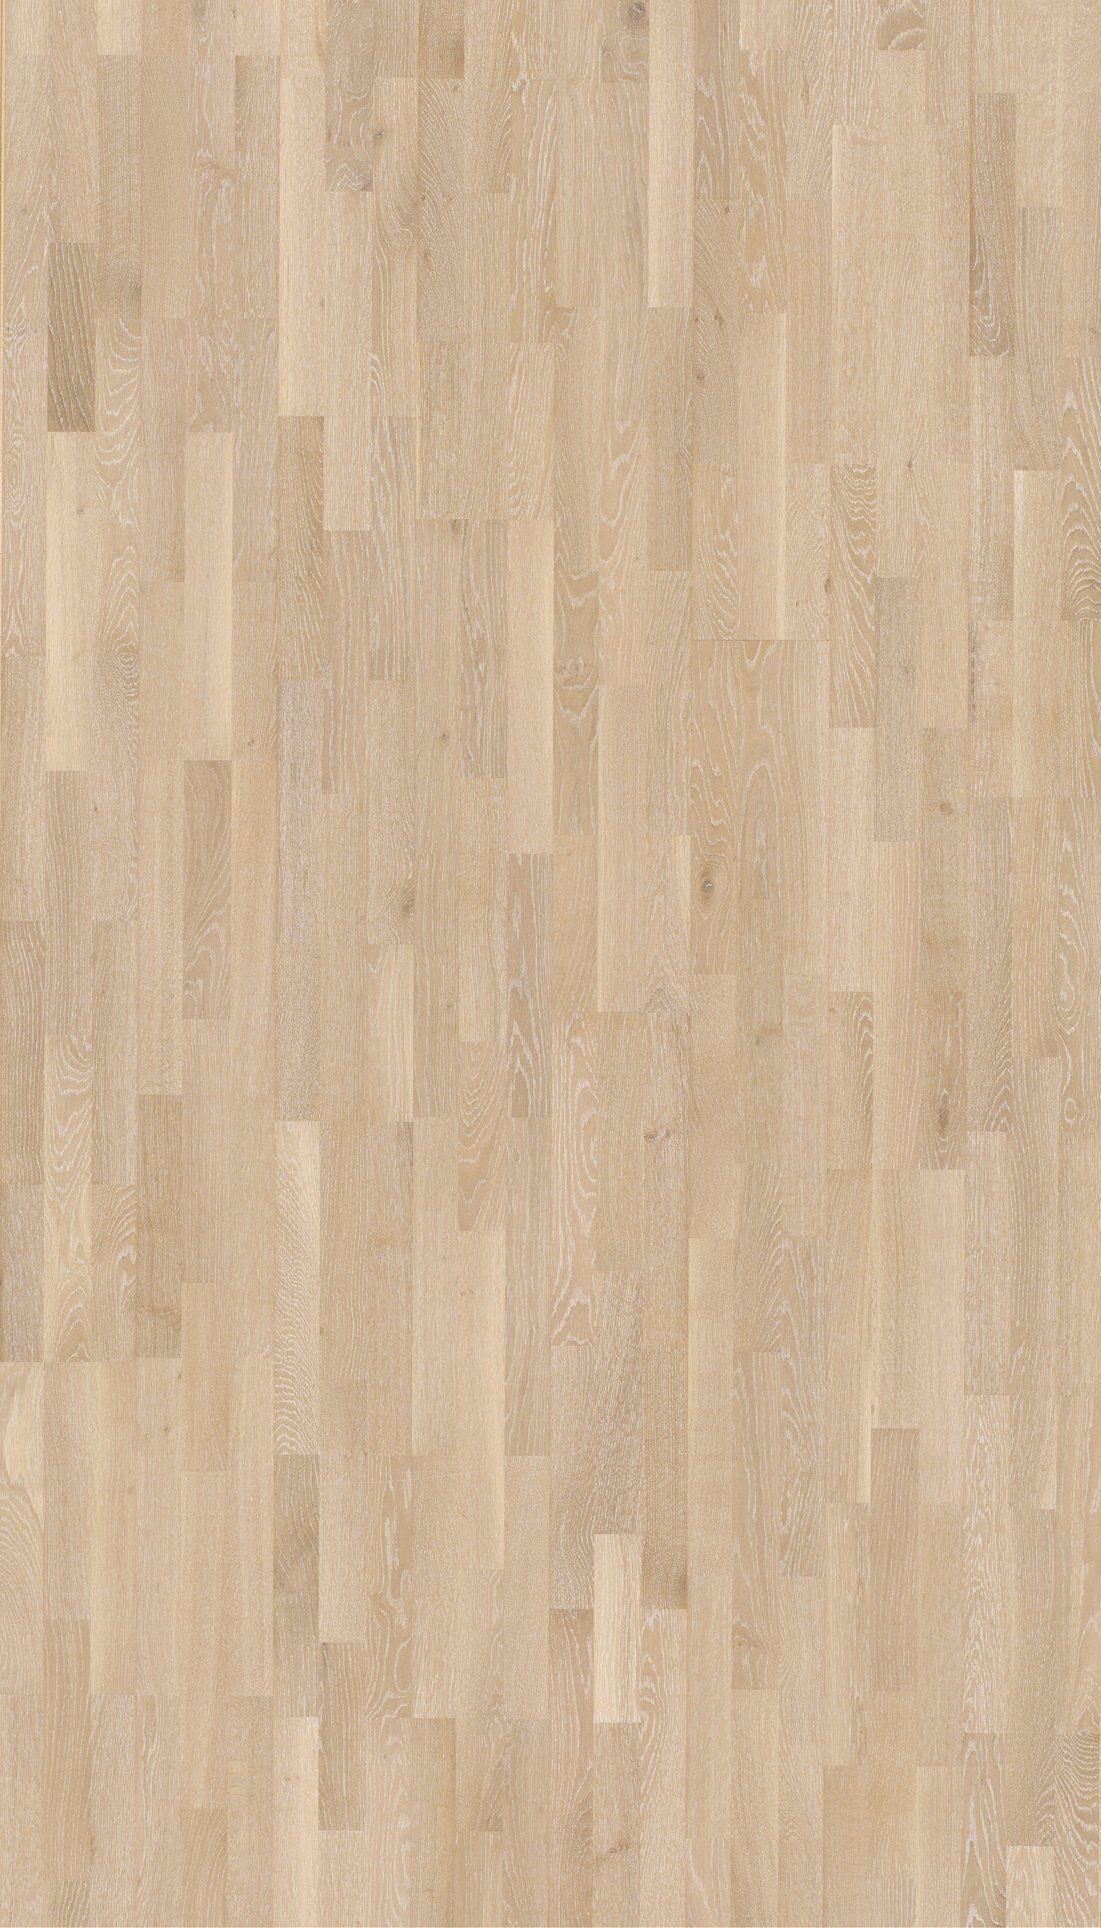 PARADOR Parkett »Basic Rustikal - Eiche Weißpore«, 2200 x 185 mm, Stärke: 11,5 mm, 4,07 m²